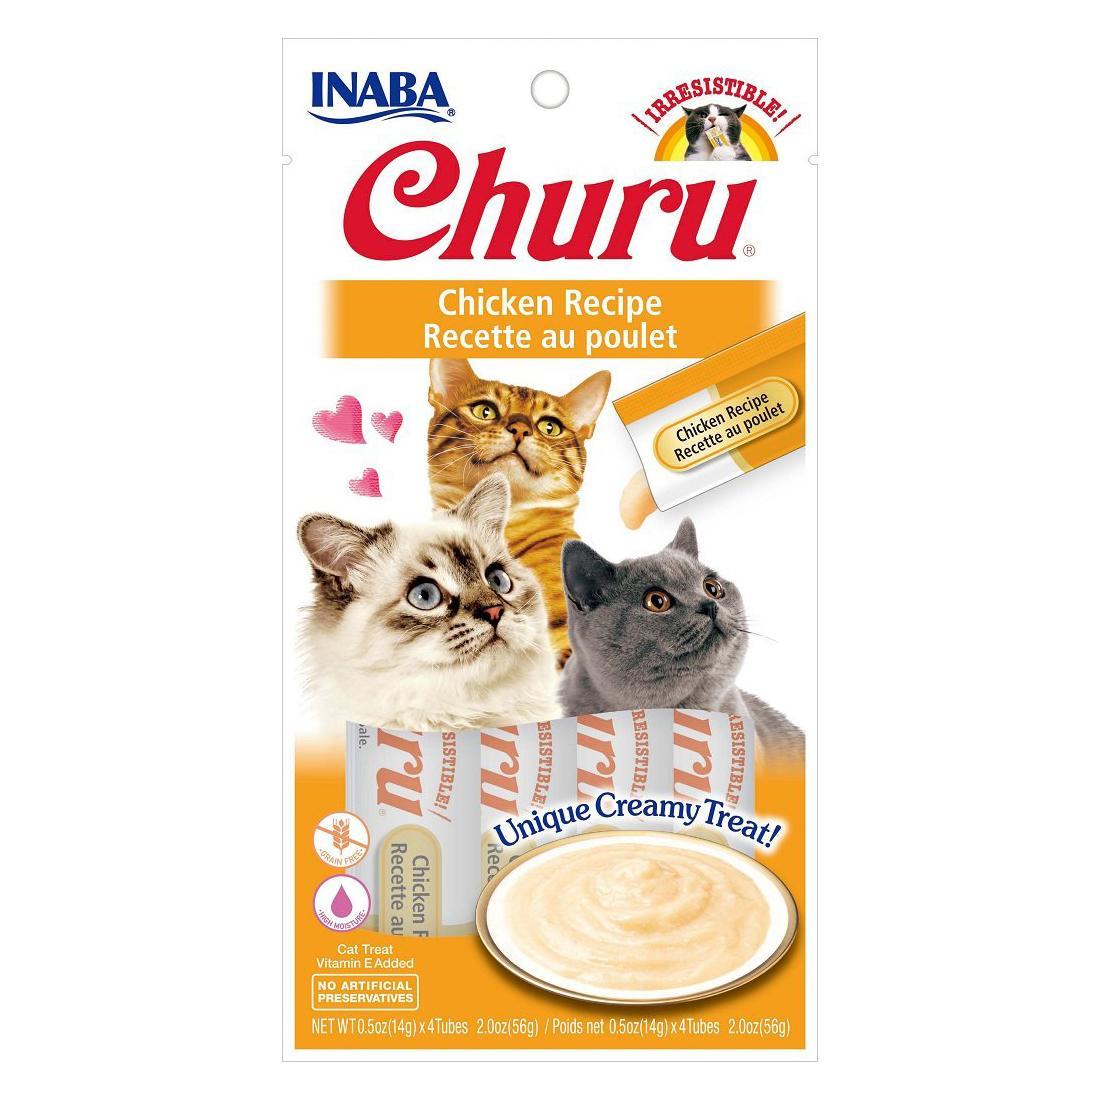 Inaba Churu Puree Grain-Free Cat Treats - Chicken